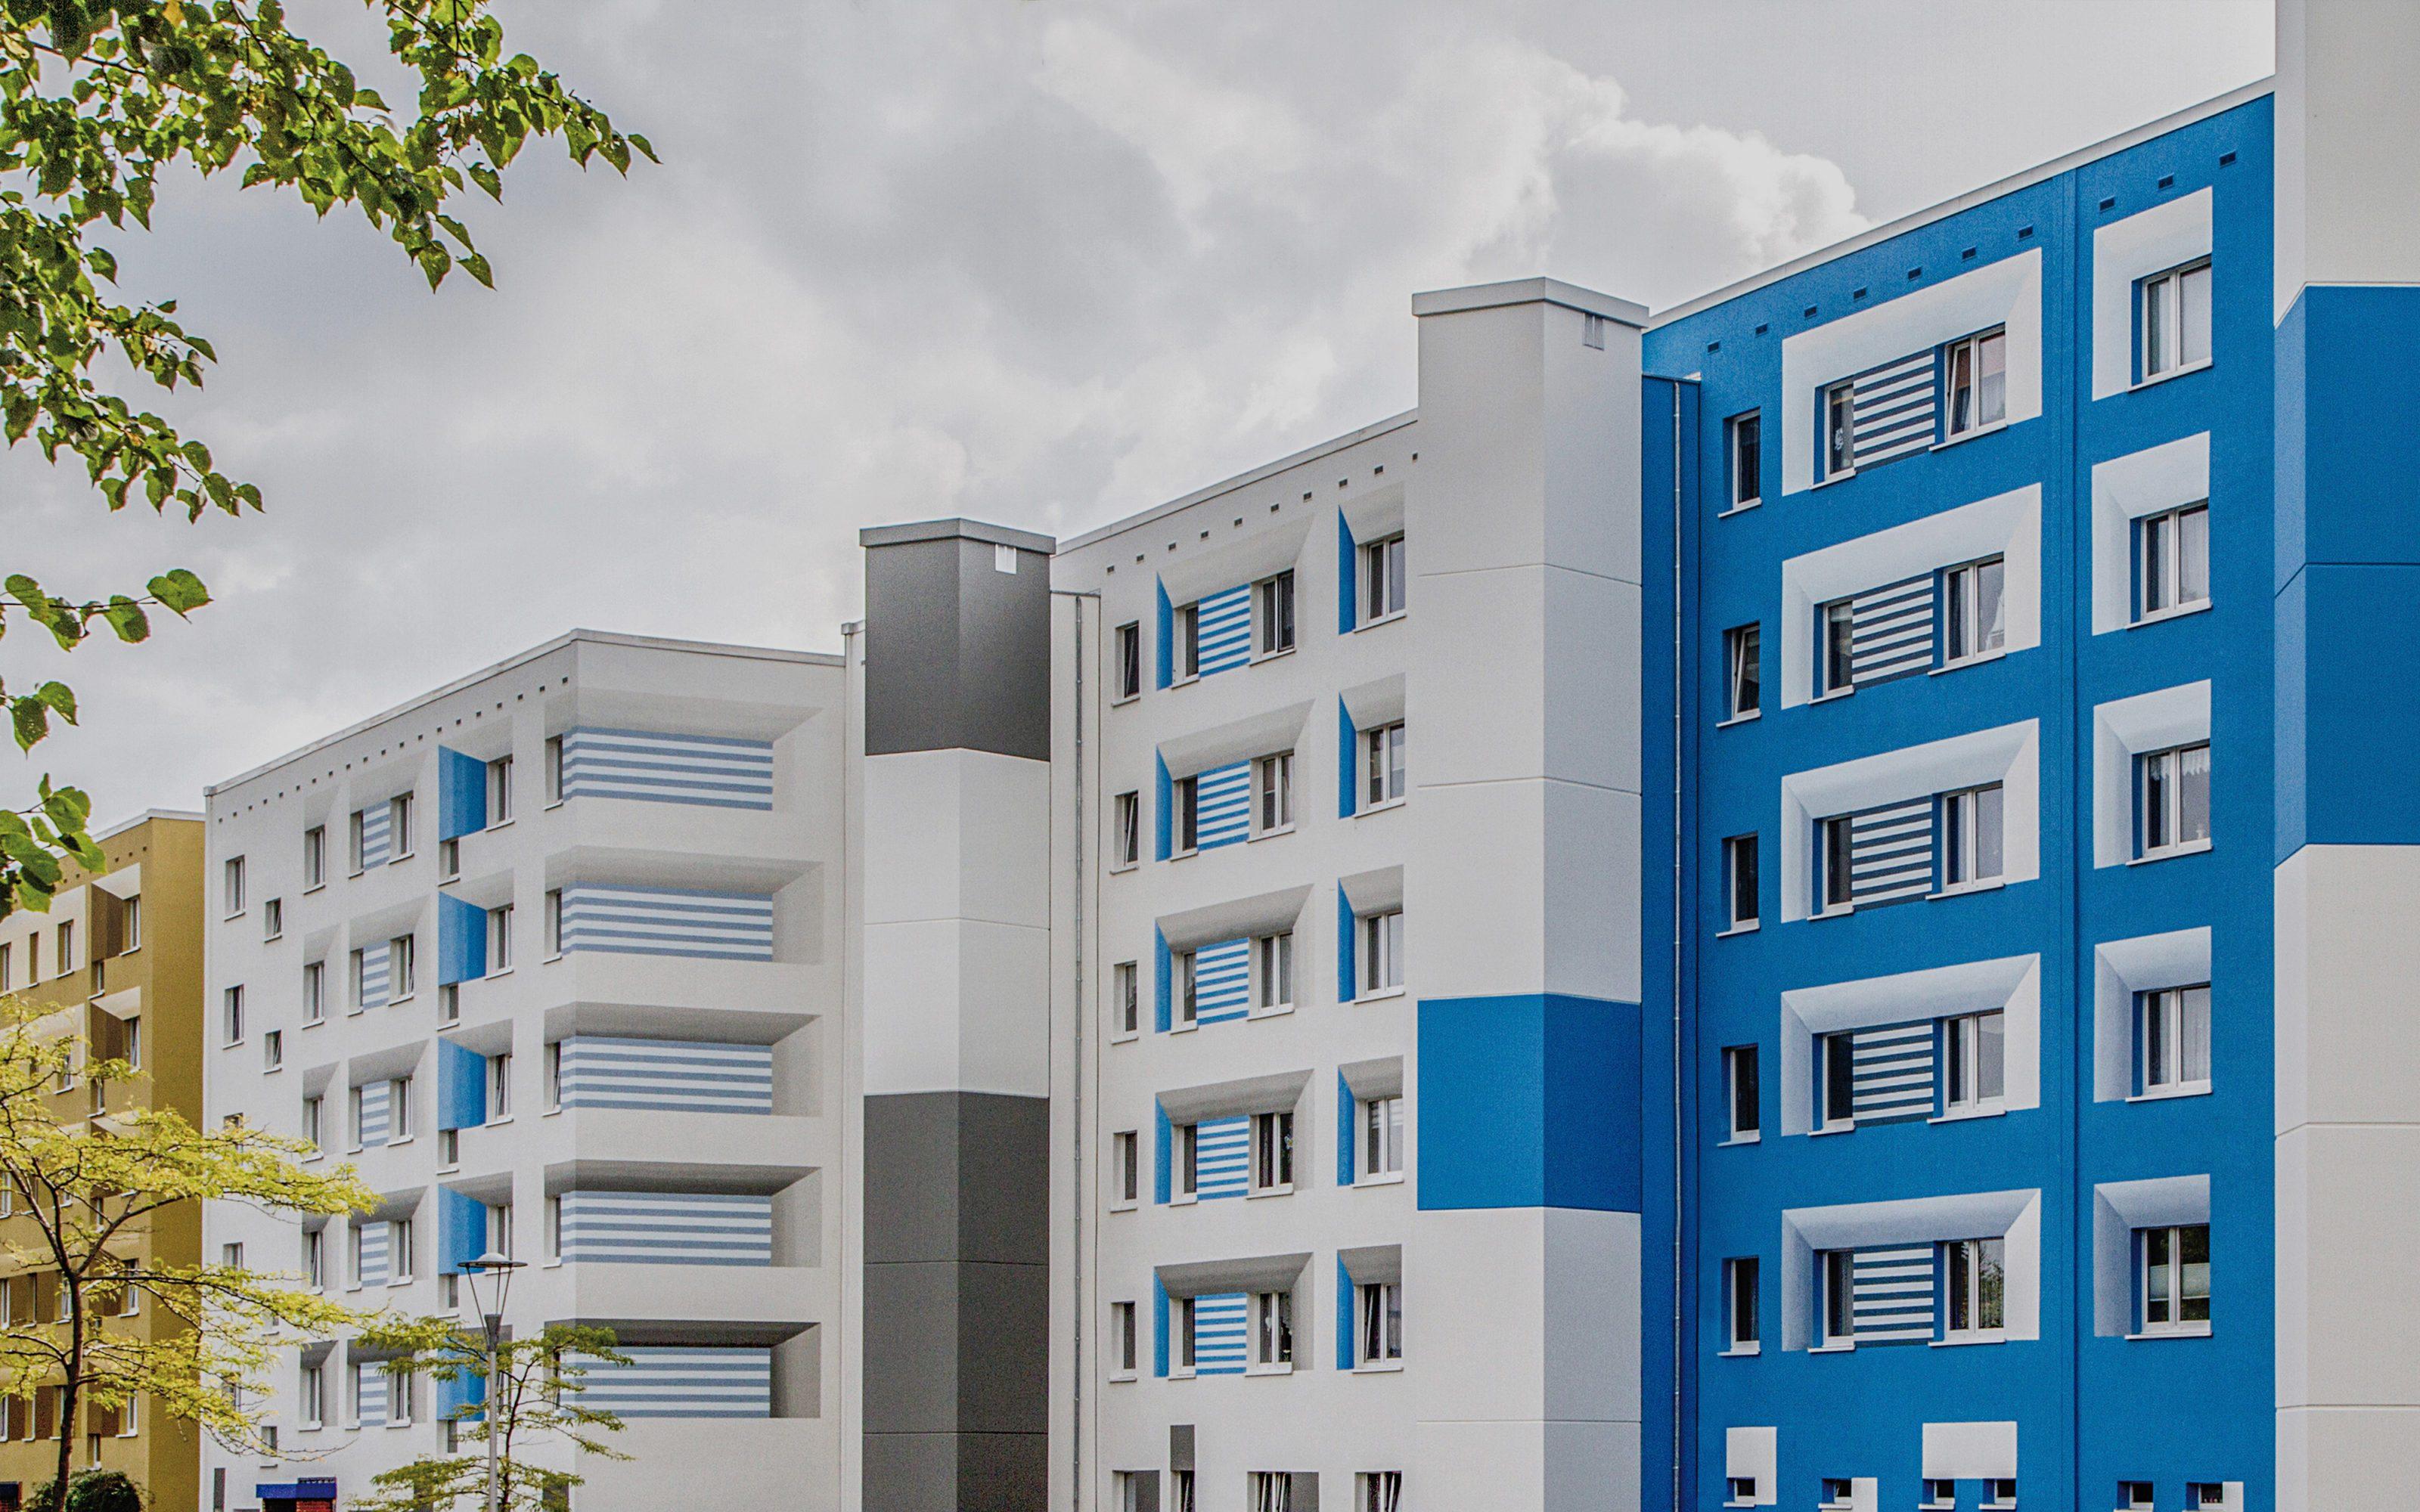 GRACO-Stralsund-Fassadenmalerei-Design-Projekt